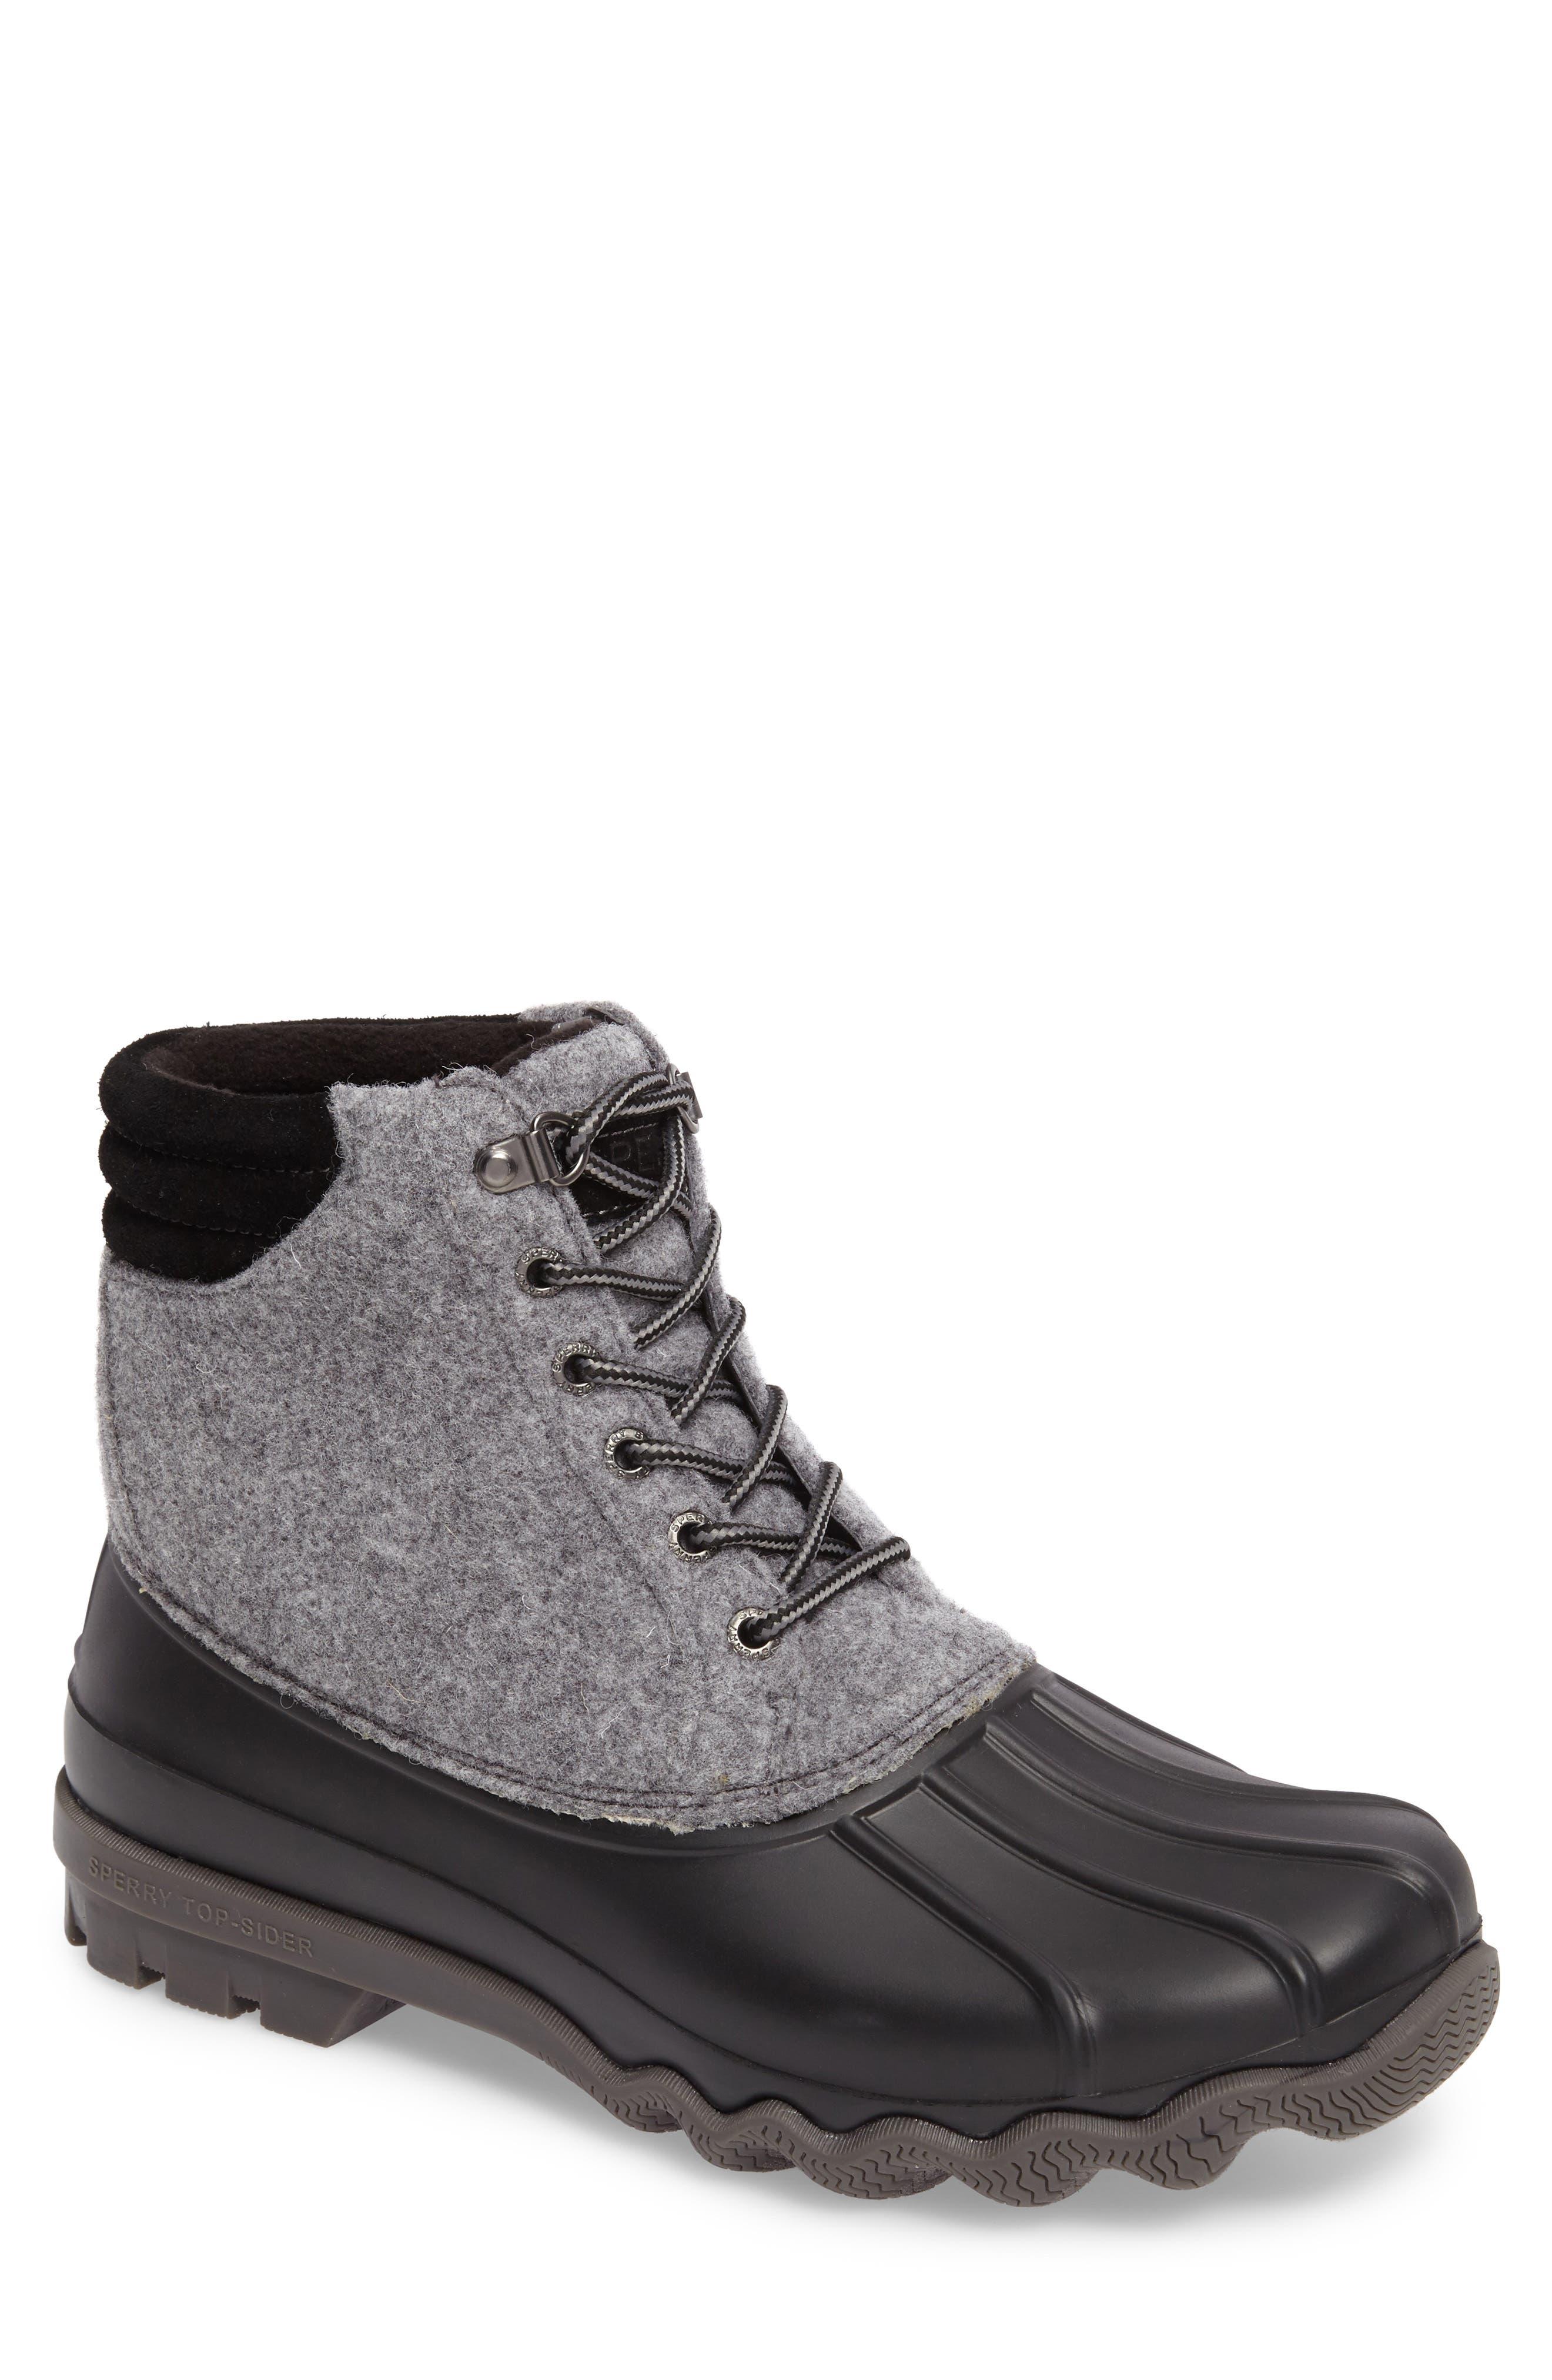 Avenue Rain Boot,                         Main,                         color, Grey Leather